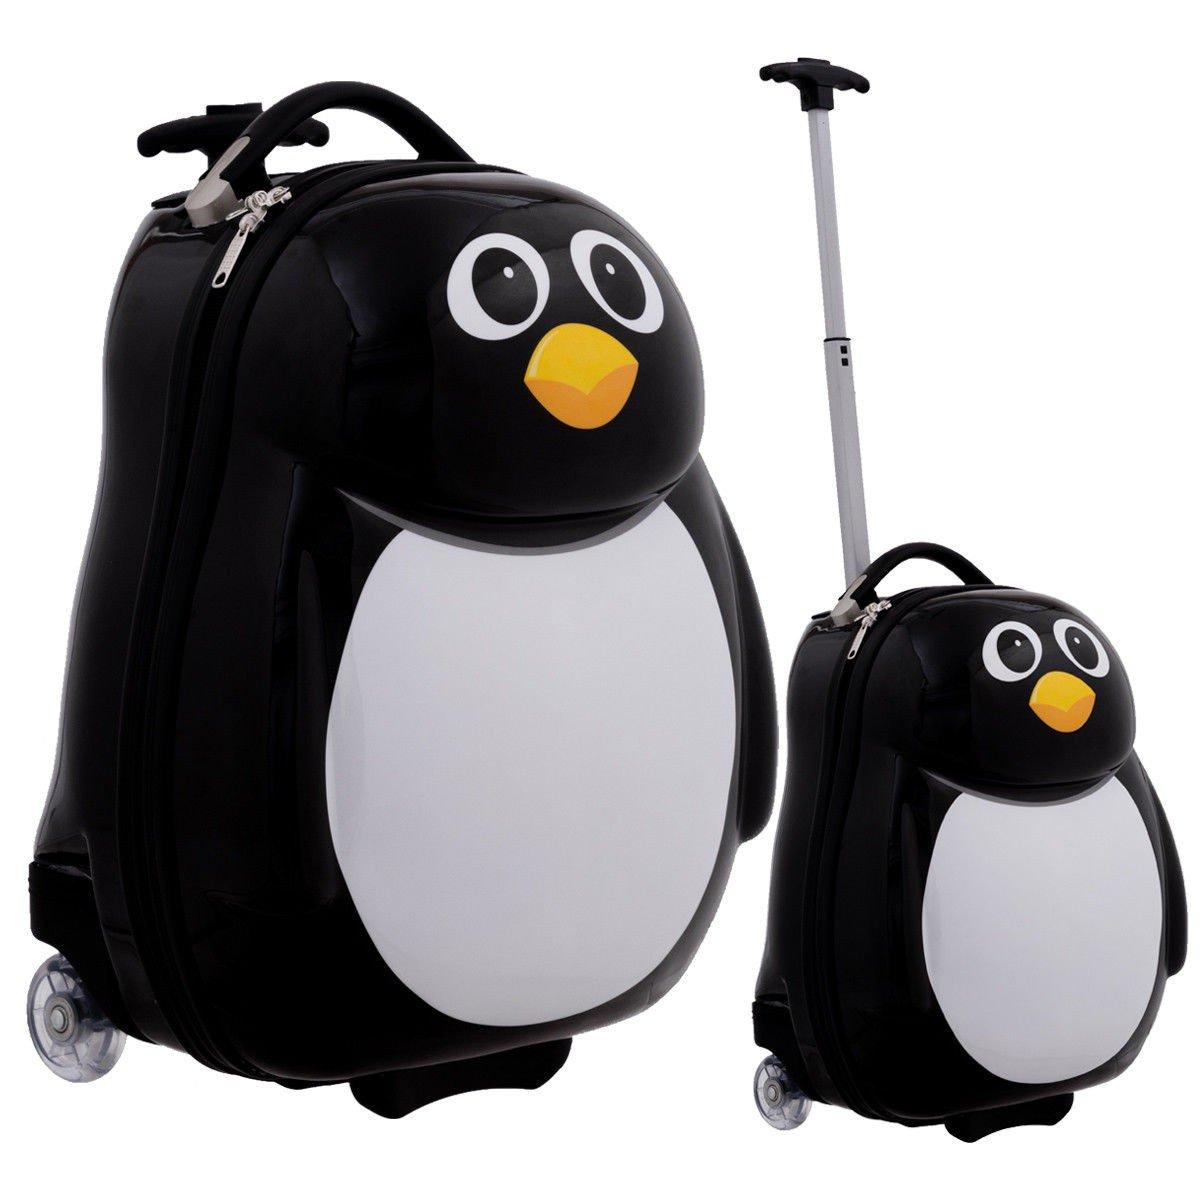 Kids旅行学校荷物スーツケース&バックパック2個ペンギン型13」と19